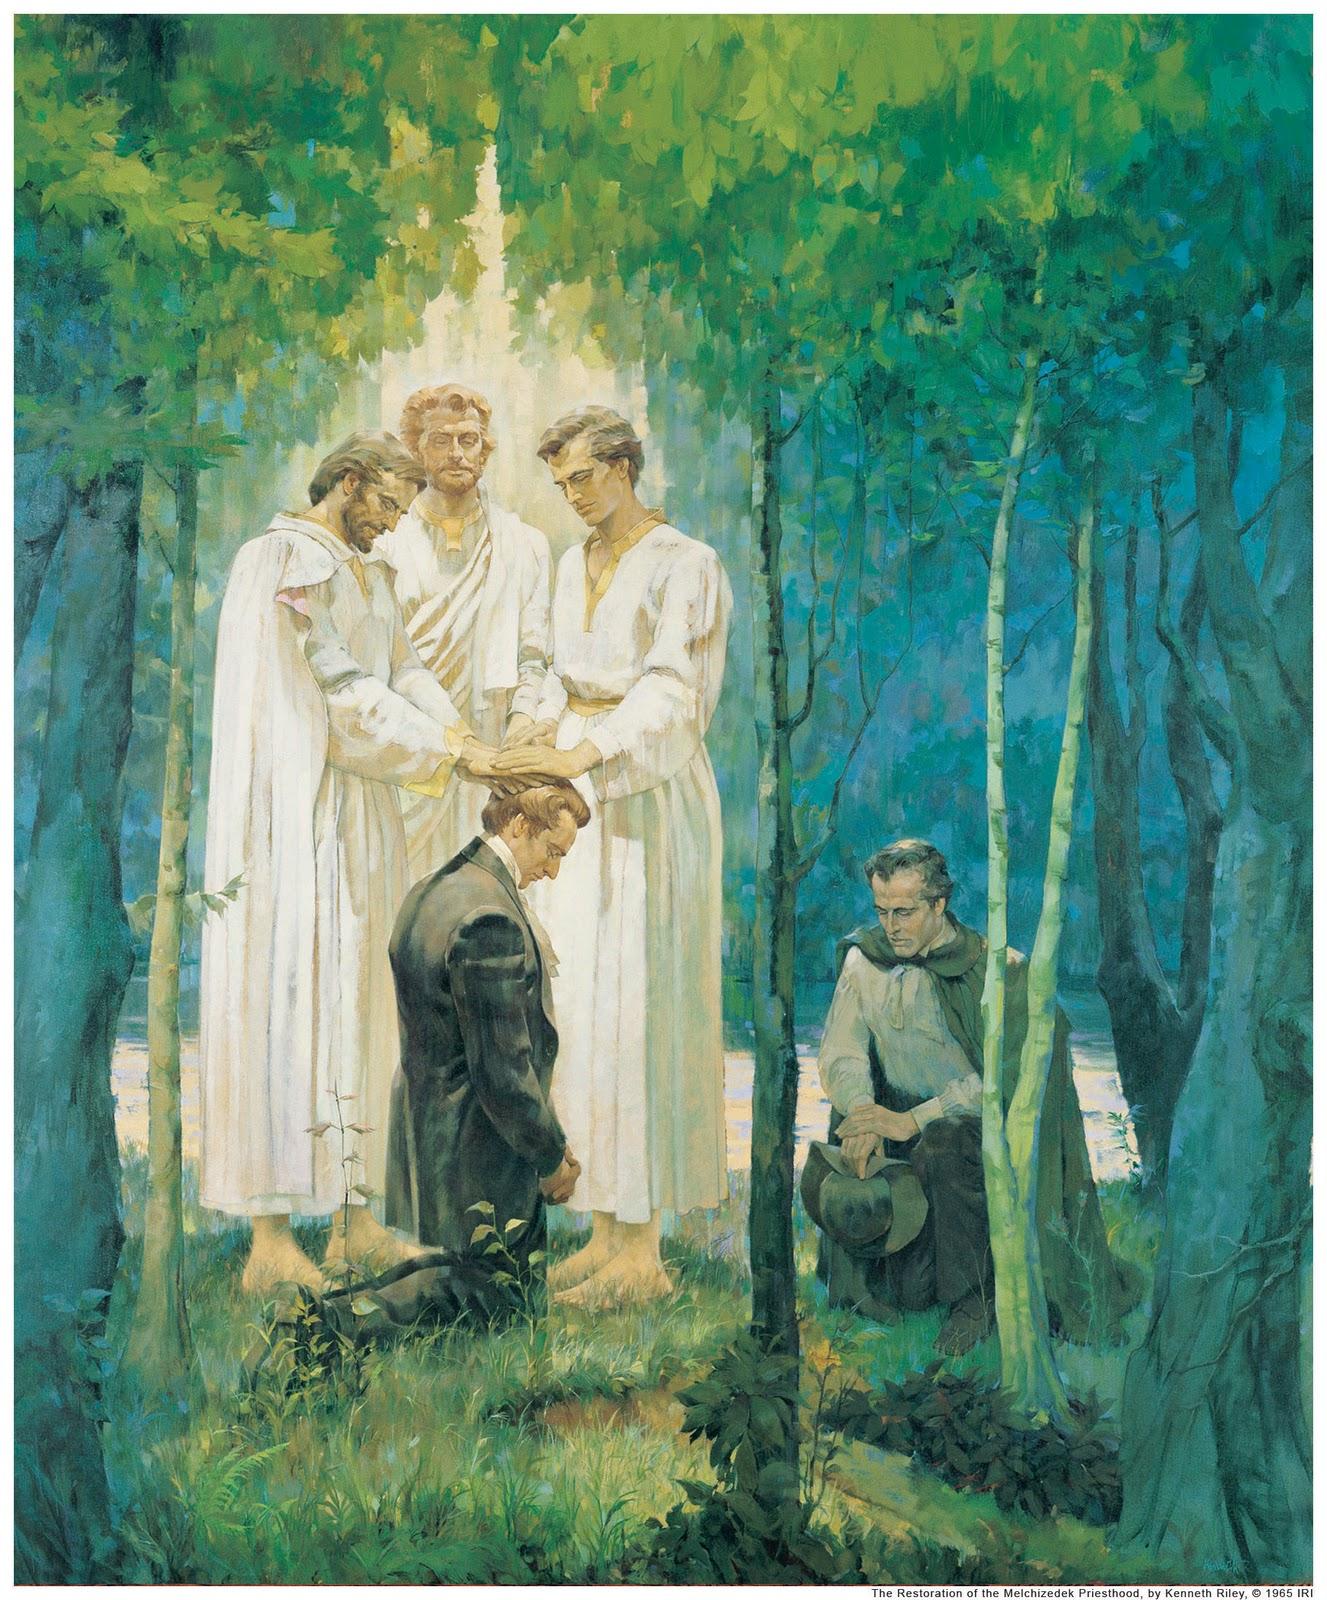 On the Priesthood (Book III)